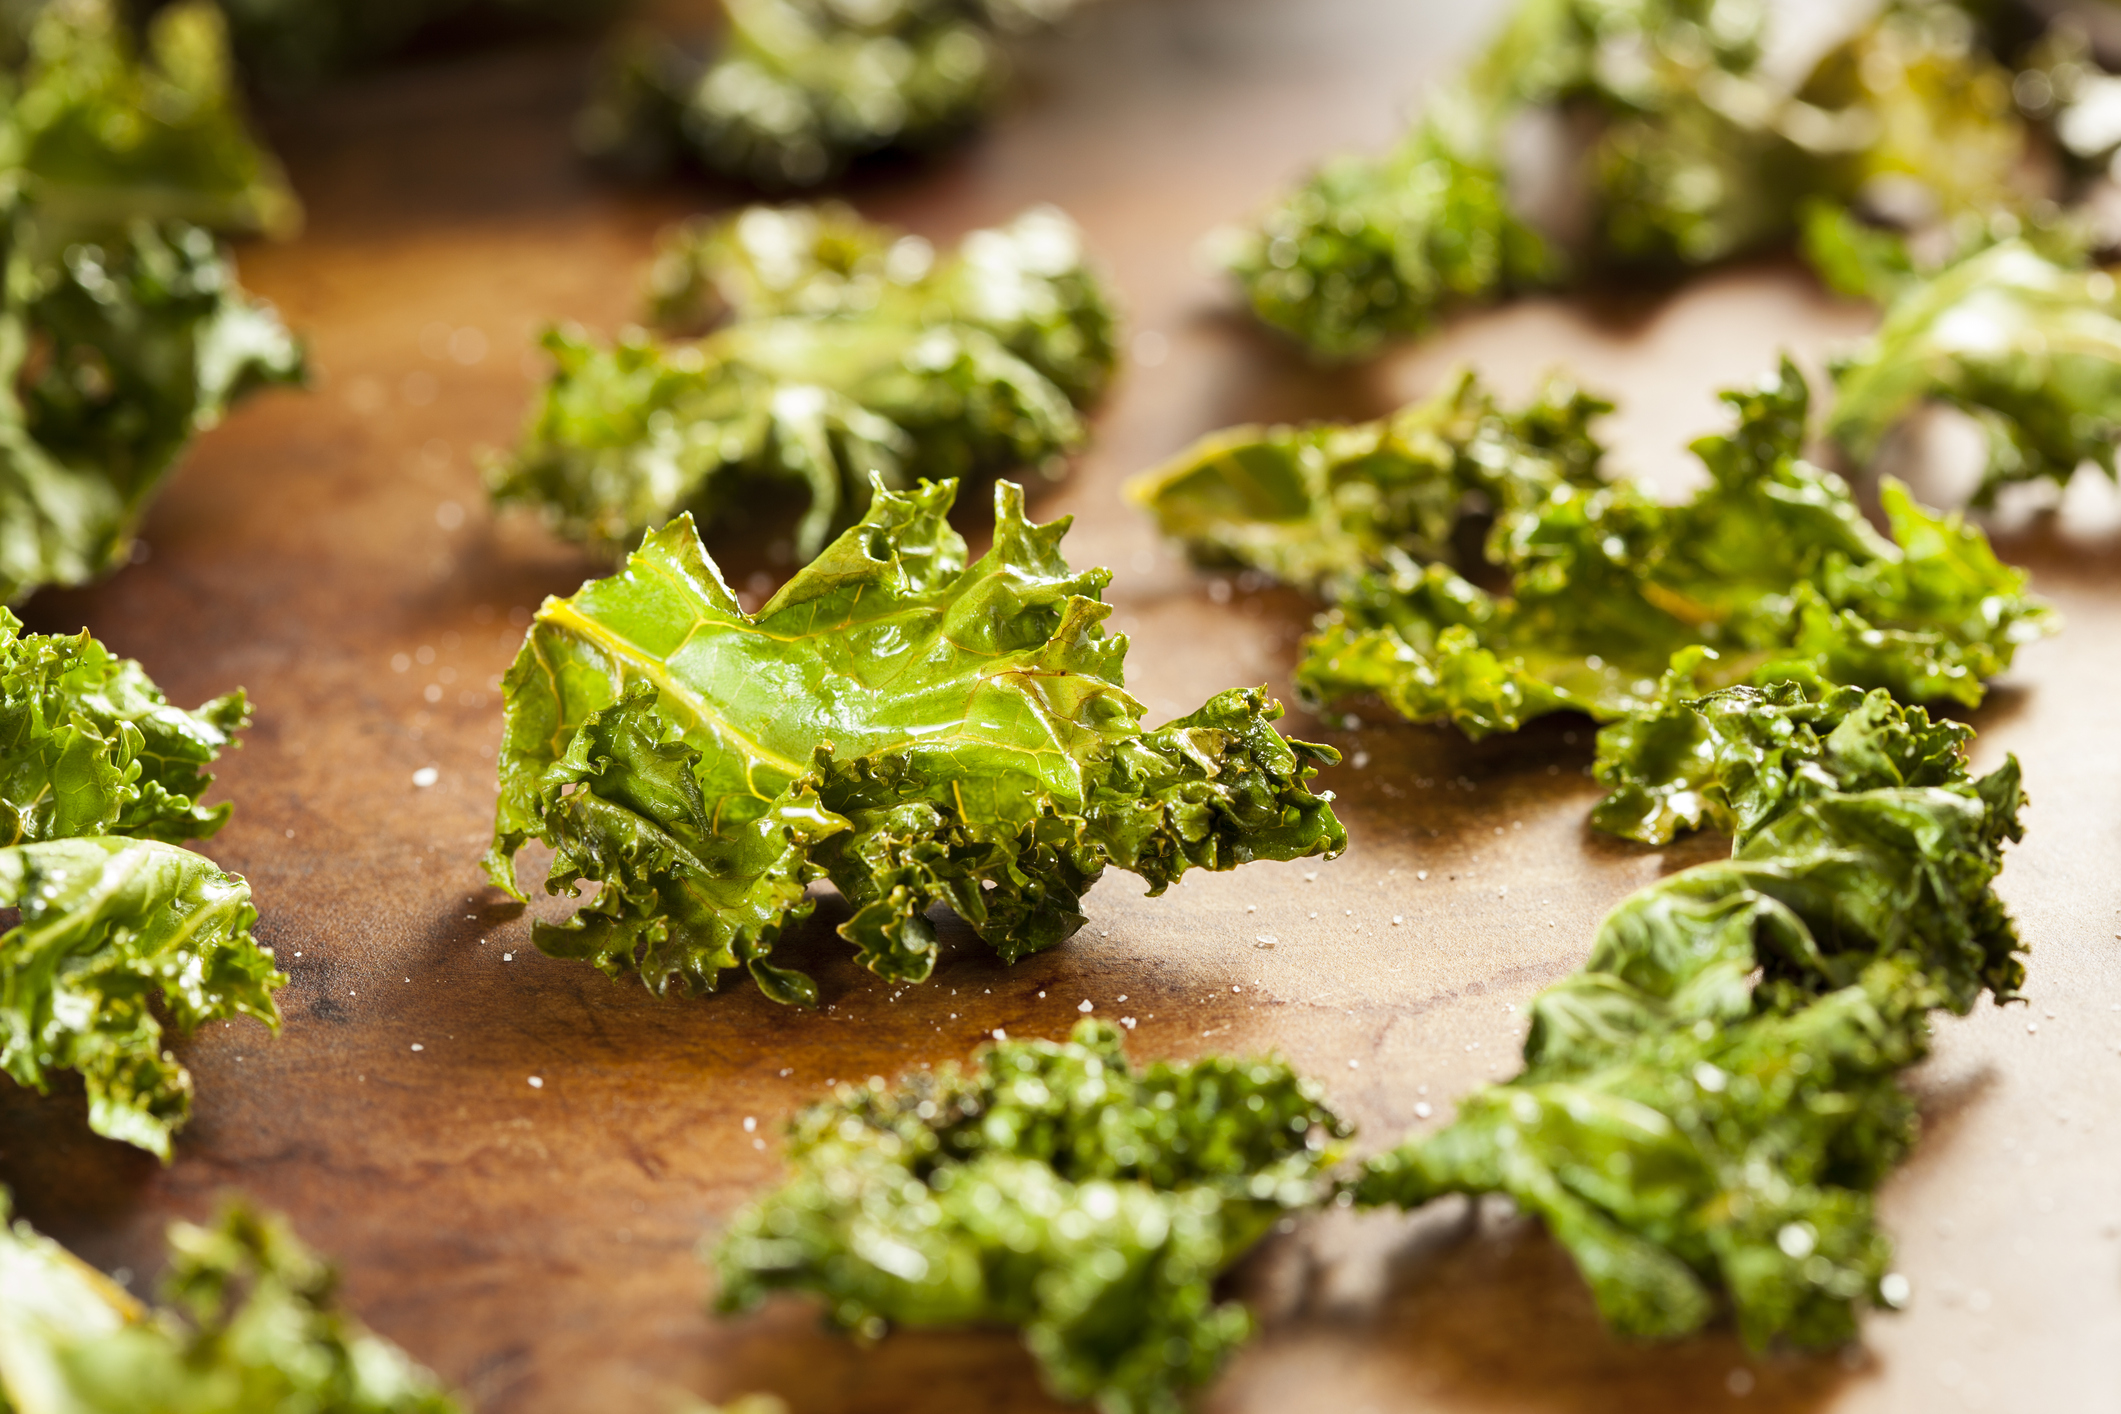 kale chips - with NutraPonics hybrid kale